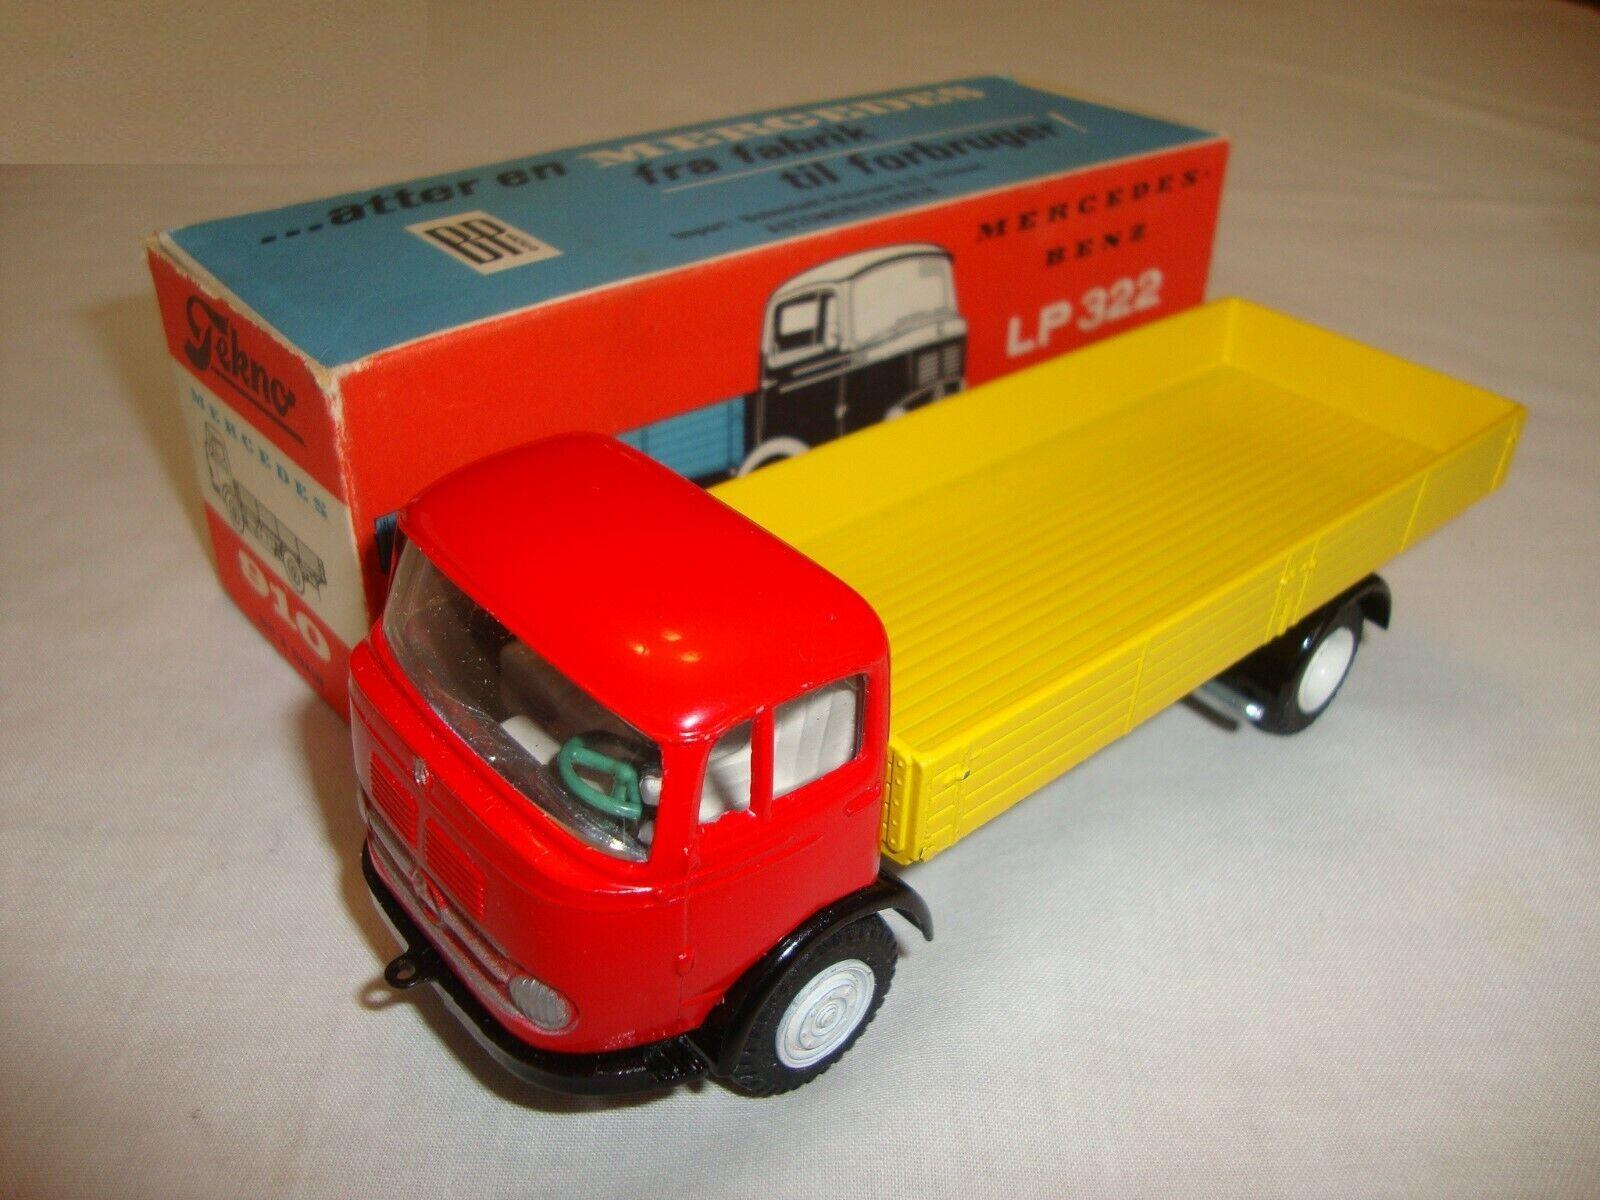 TEKNO (Danemark) 910 MERCEDES BENZ LP  322 CAMION-nr Comme neuf in original box  prix le moins cher